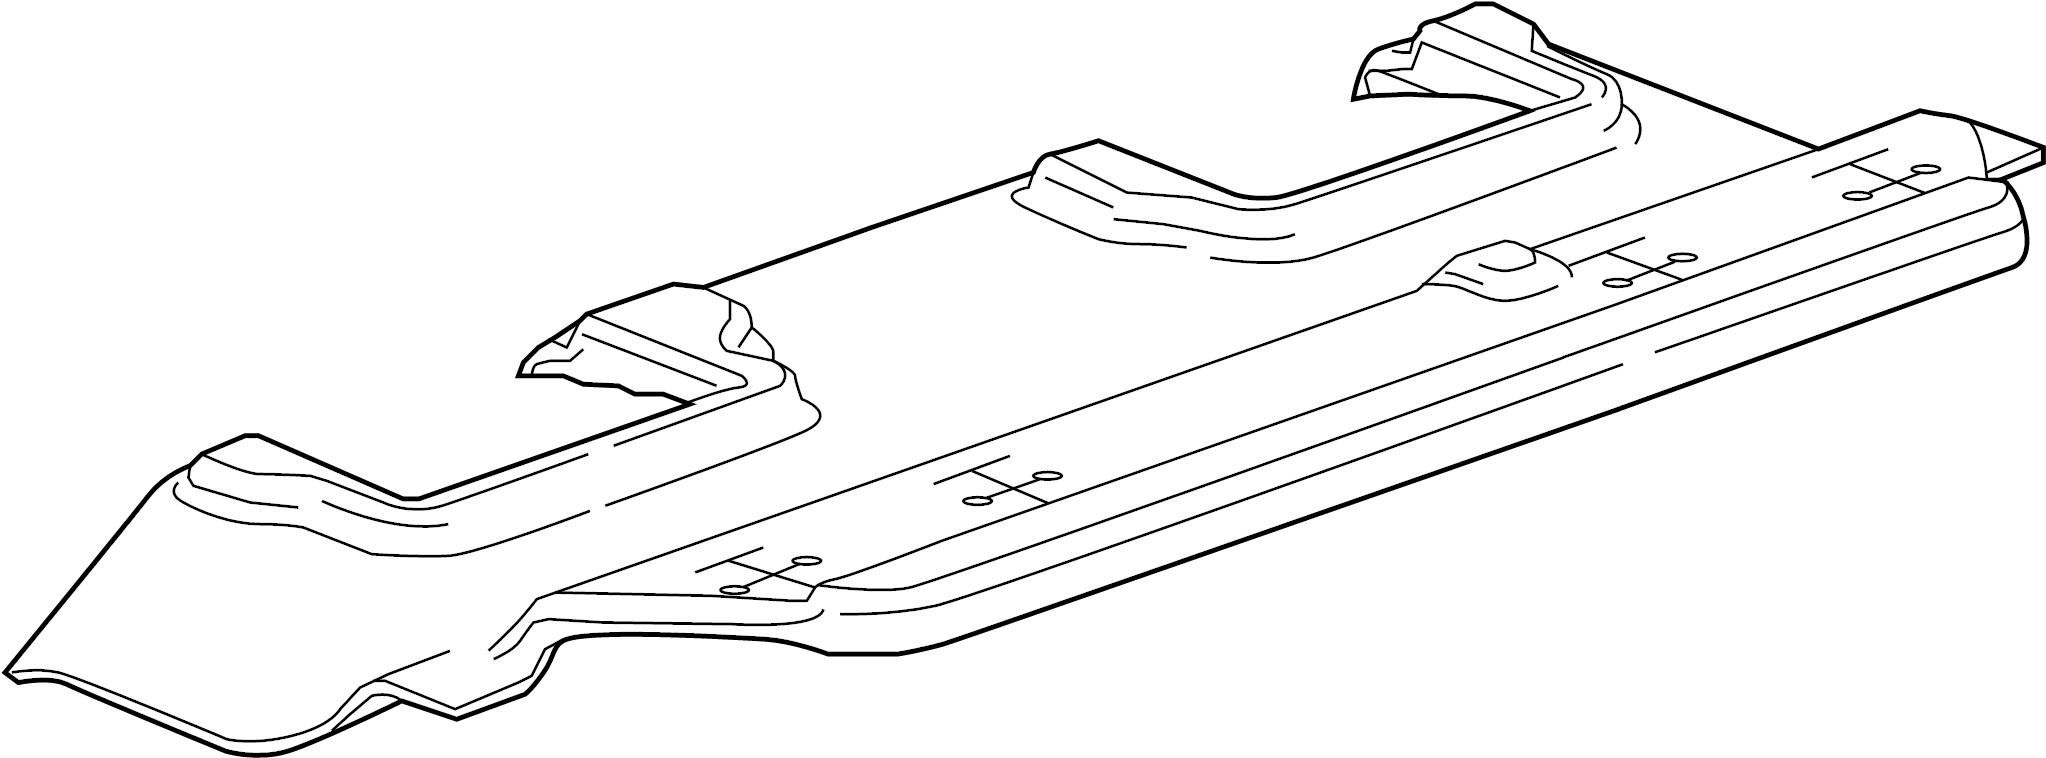 GMC Yukon XL Seat Track Cover. Seats, ROW, Cocoa